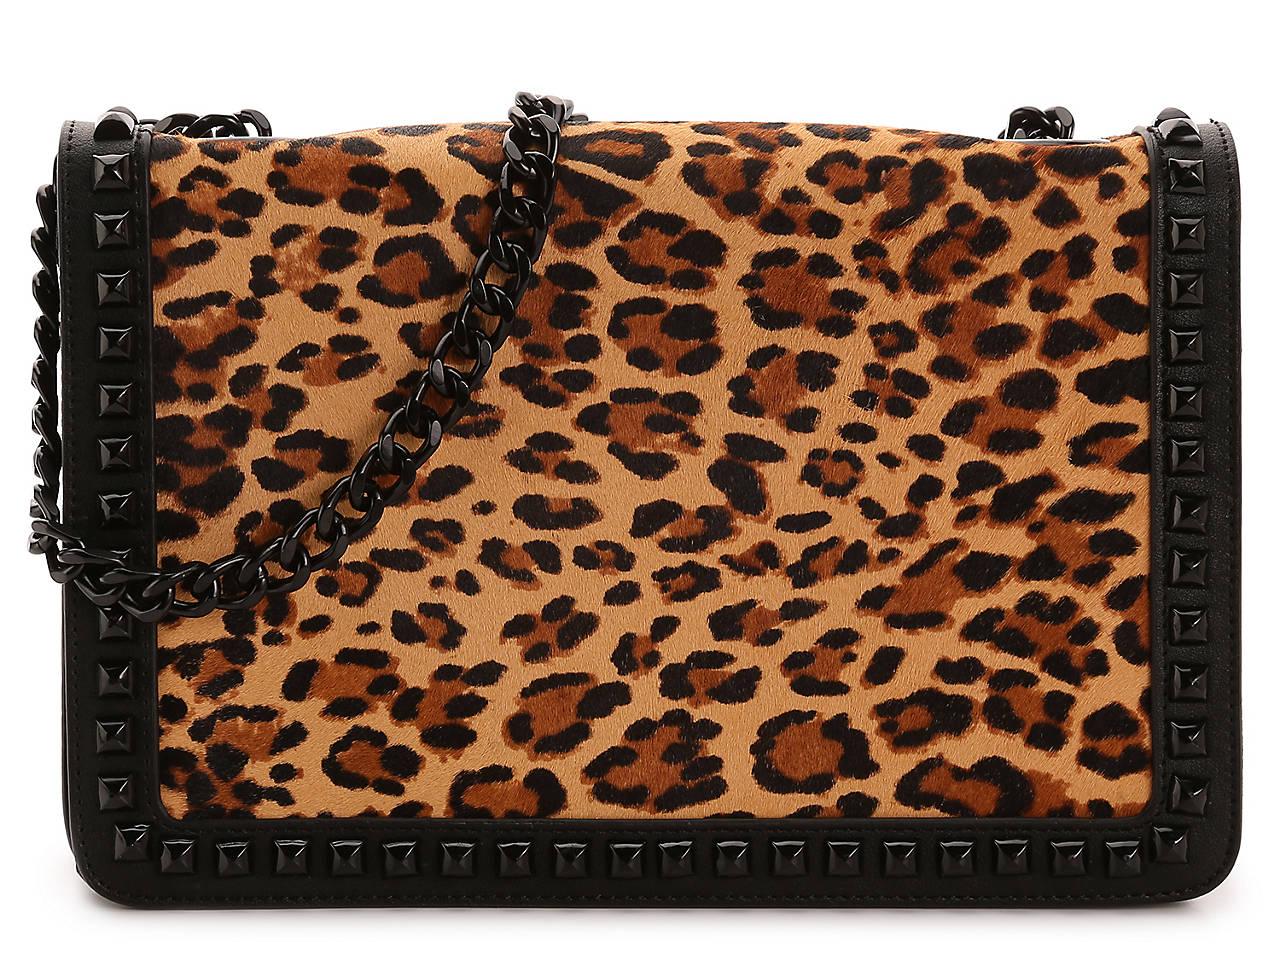 bf1b6526965 Aldo Biassono Crossbody Bag Women s Handbags   Accessories